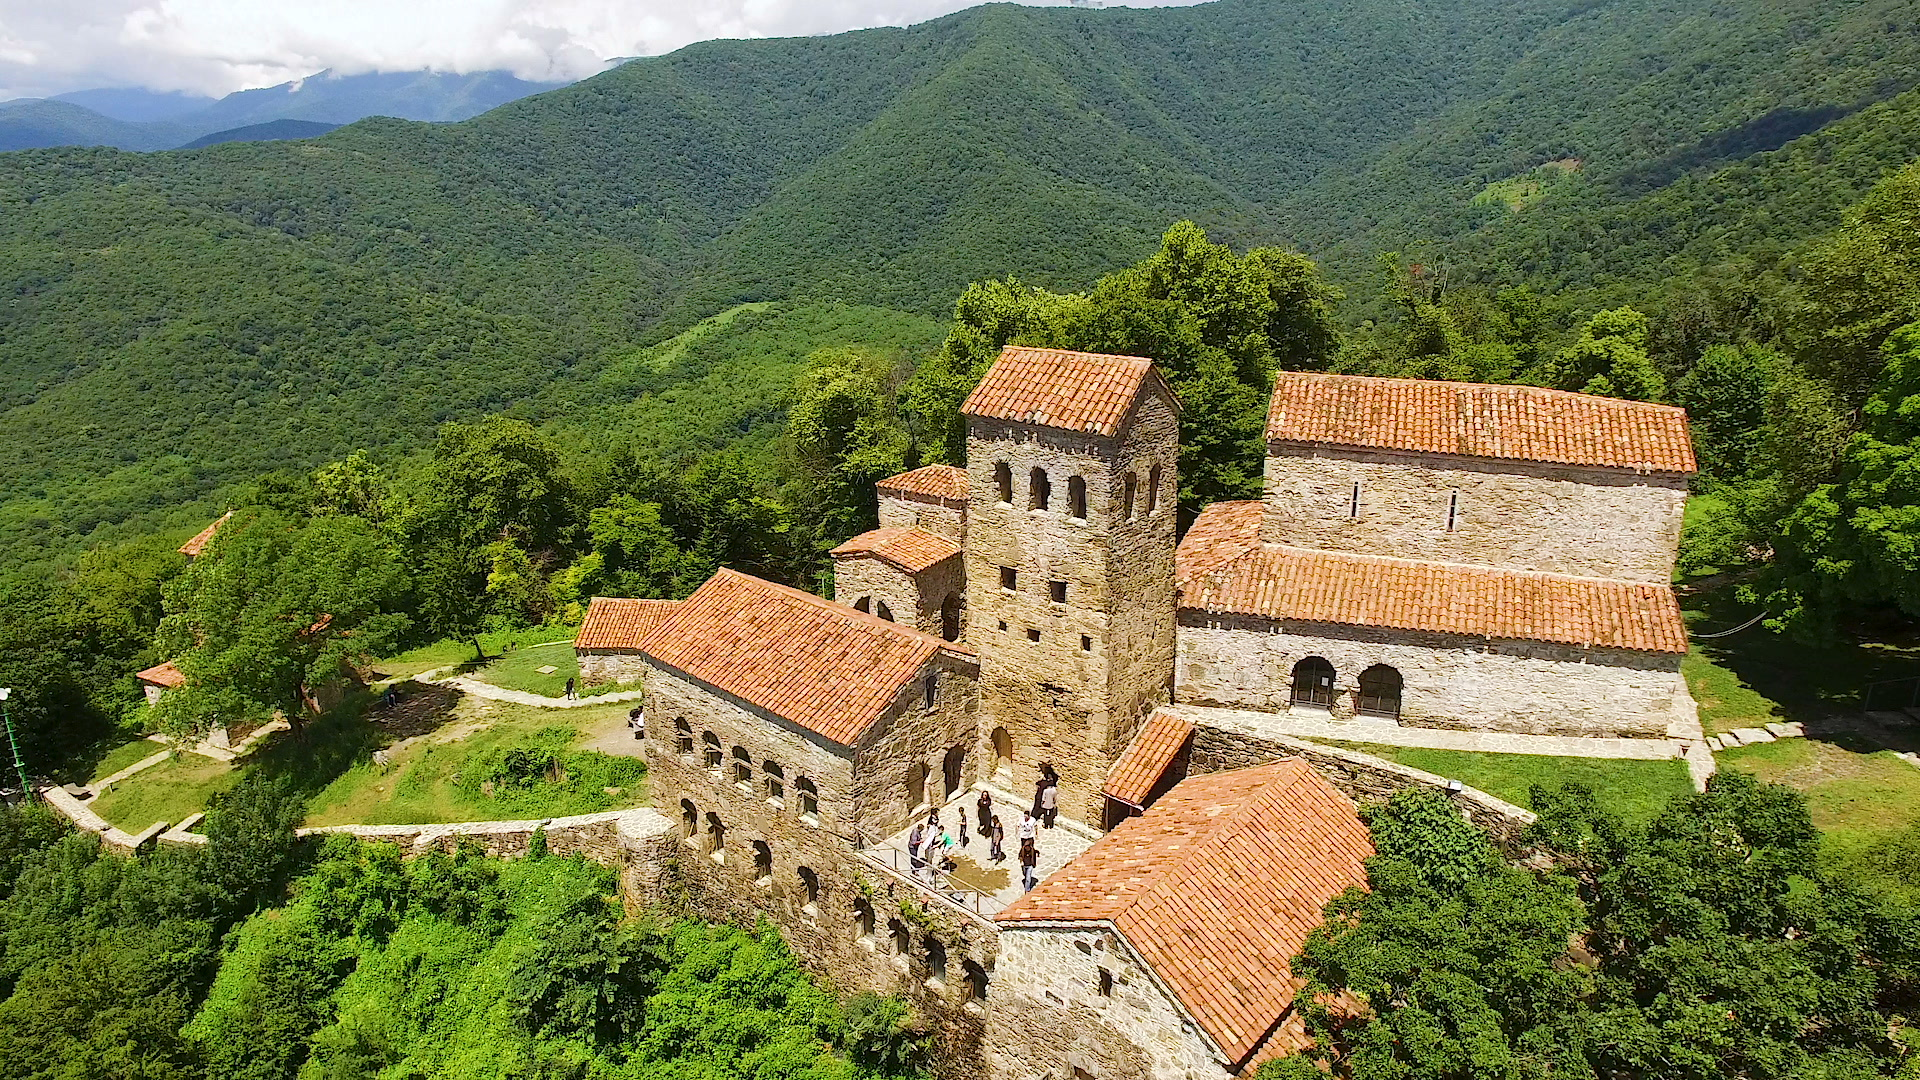 aerial-shot-amazing-nekresi-monastery-footage-084071990_prevstill.jpeg